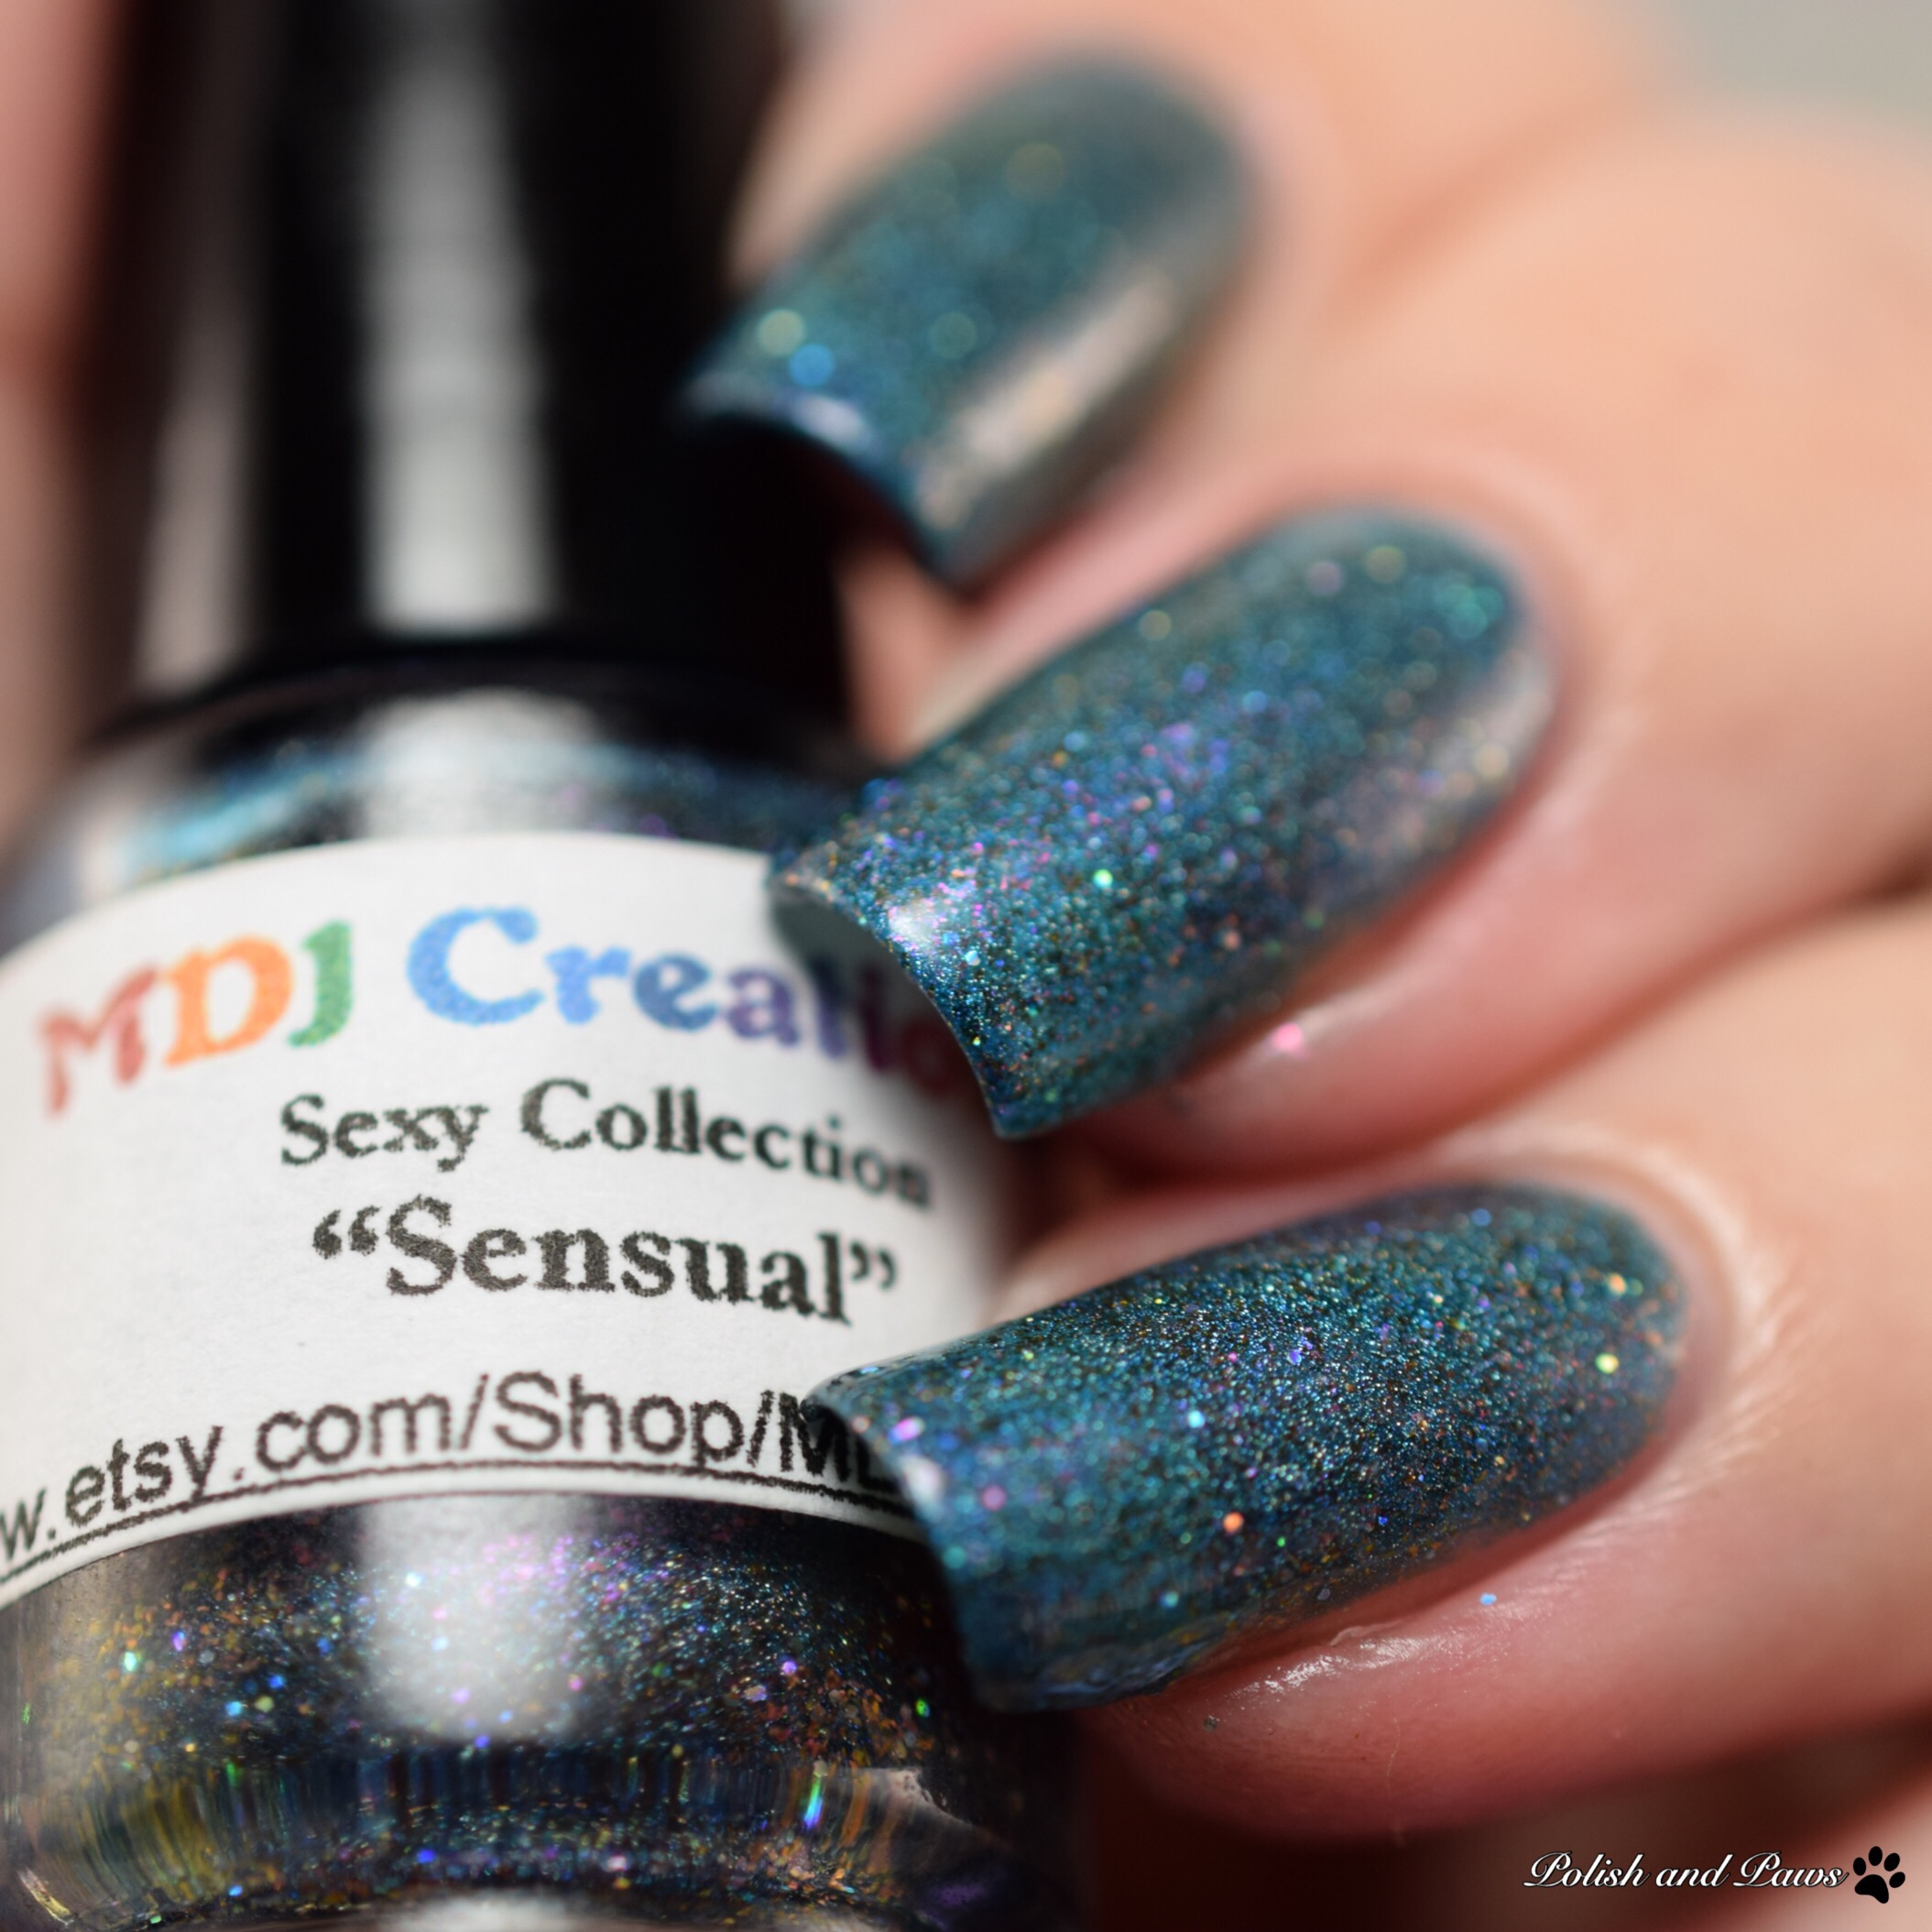 MDJ Creations Sensual